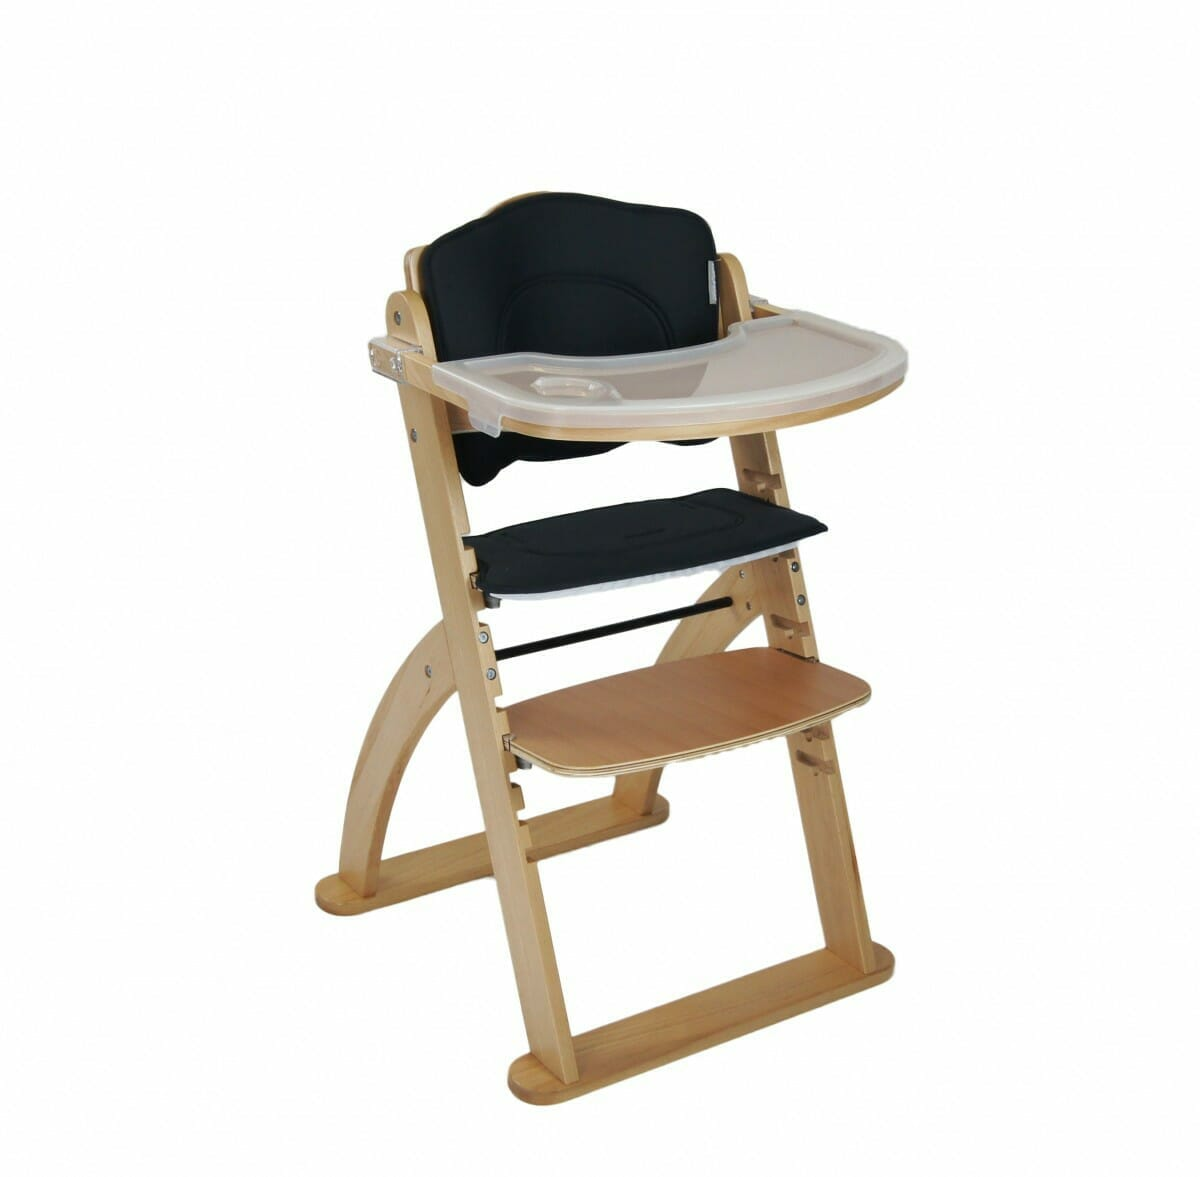 Kaylula Ava Forever High Chair Level 2